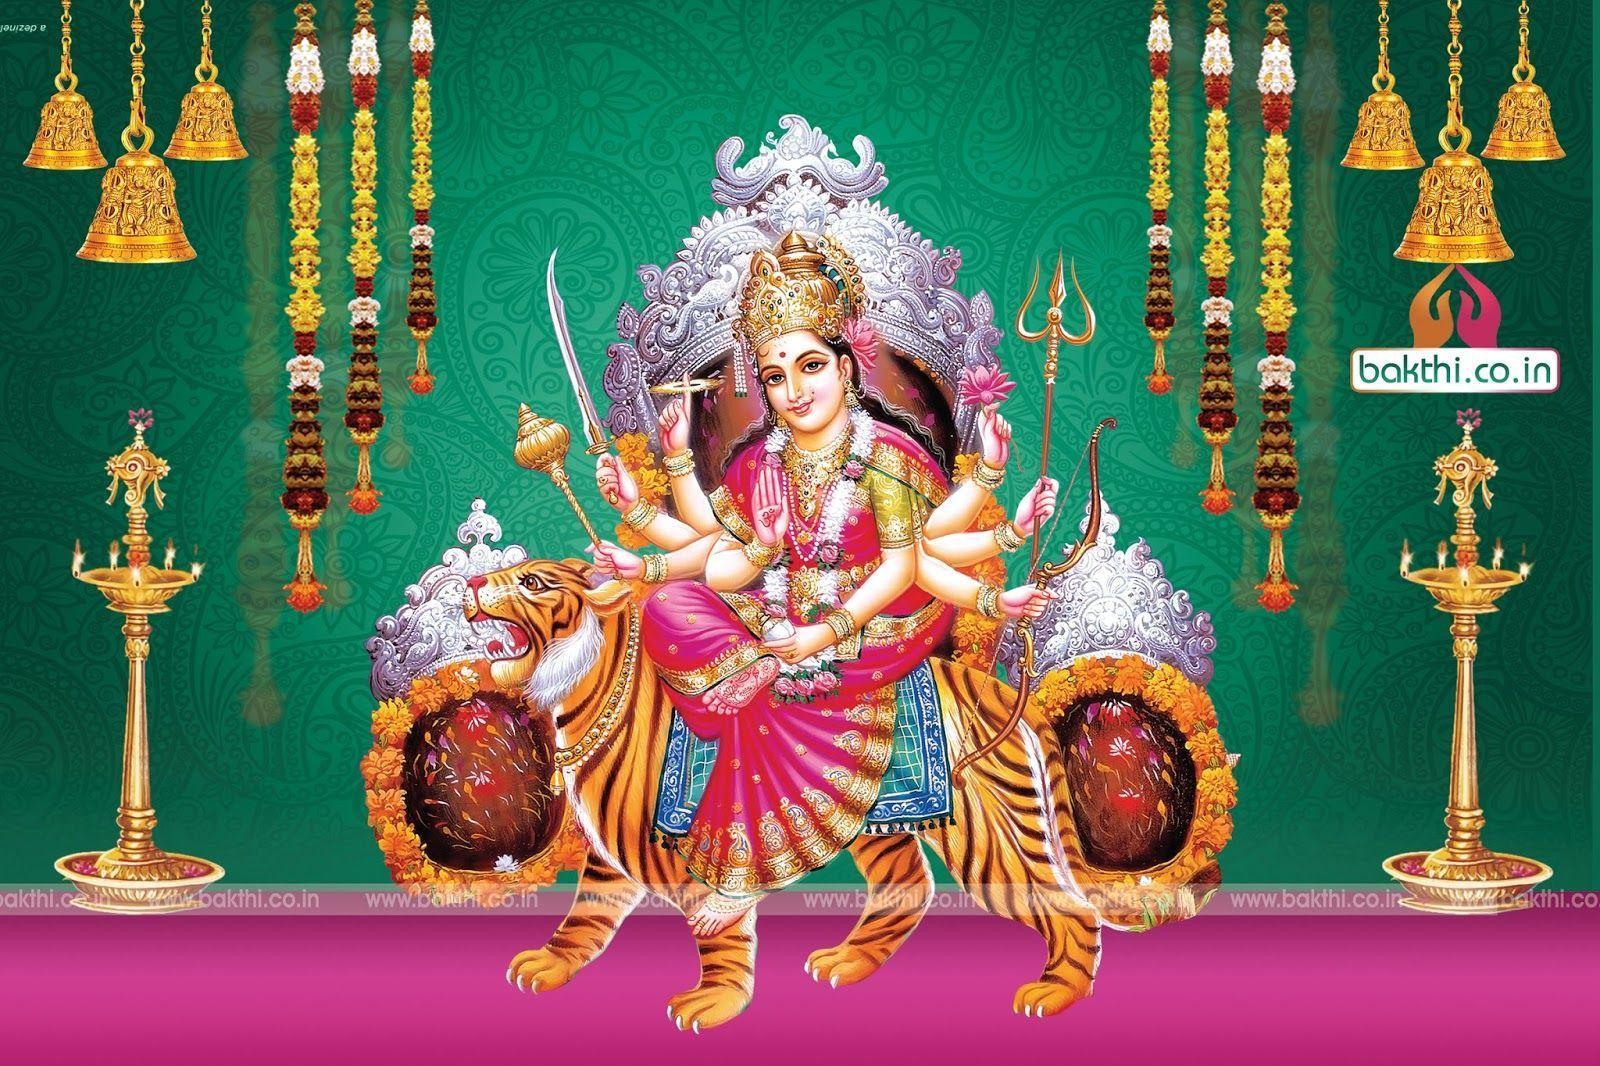 Laxmi Wallpaper Hd Madha Wallpapers Rc Pictures Hd Wallpaper Cave